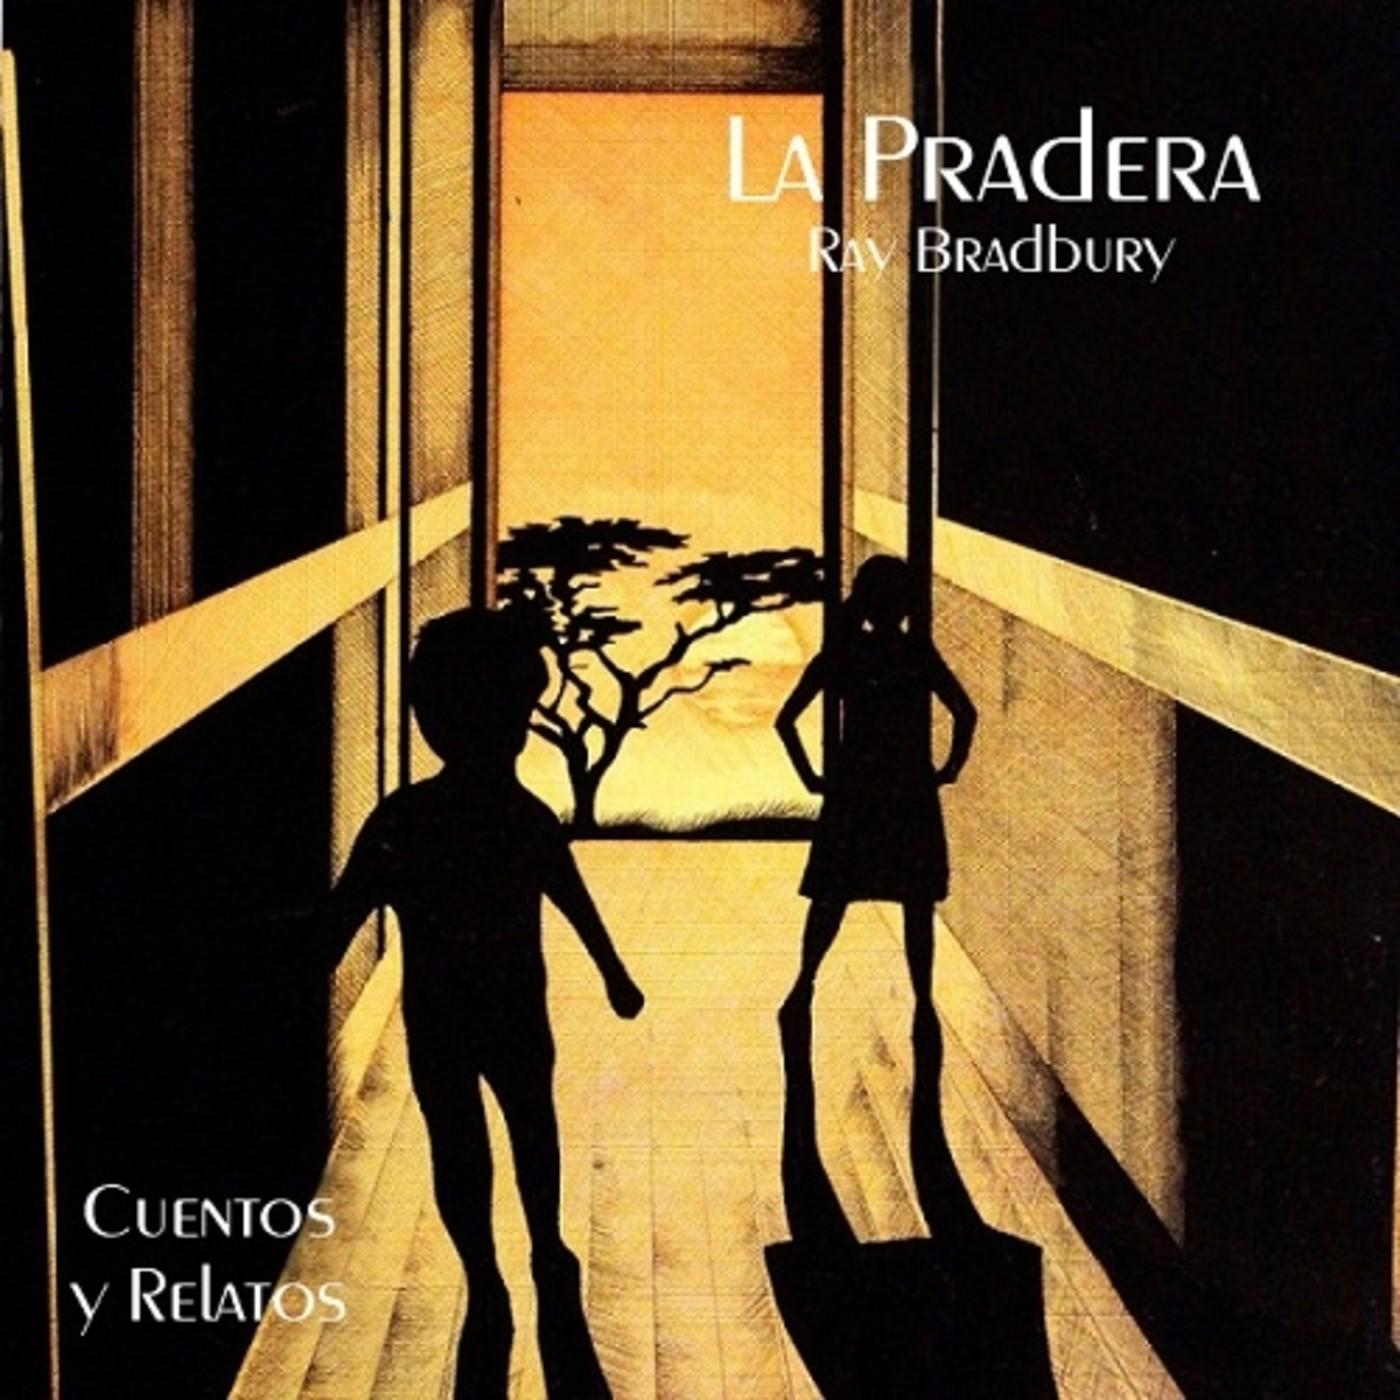 Ray-Bradbury-9